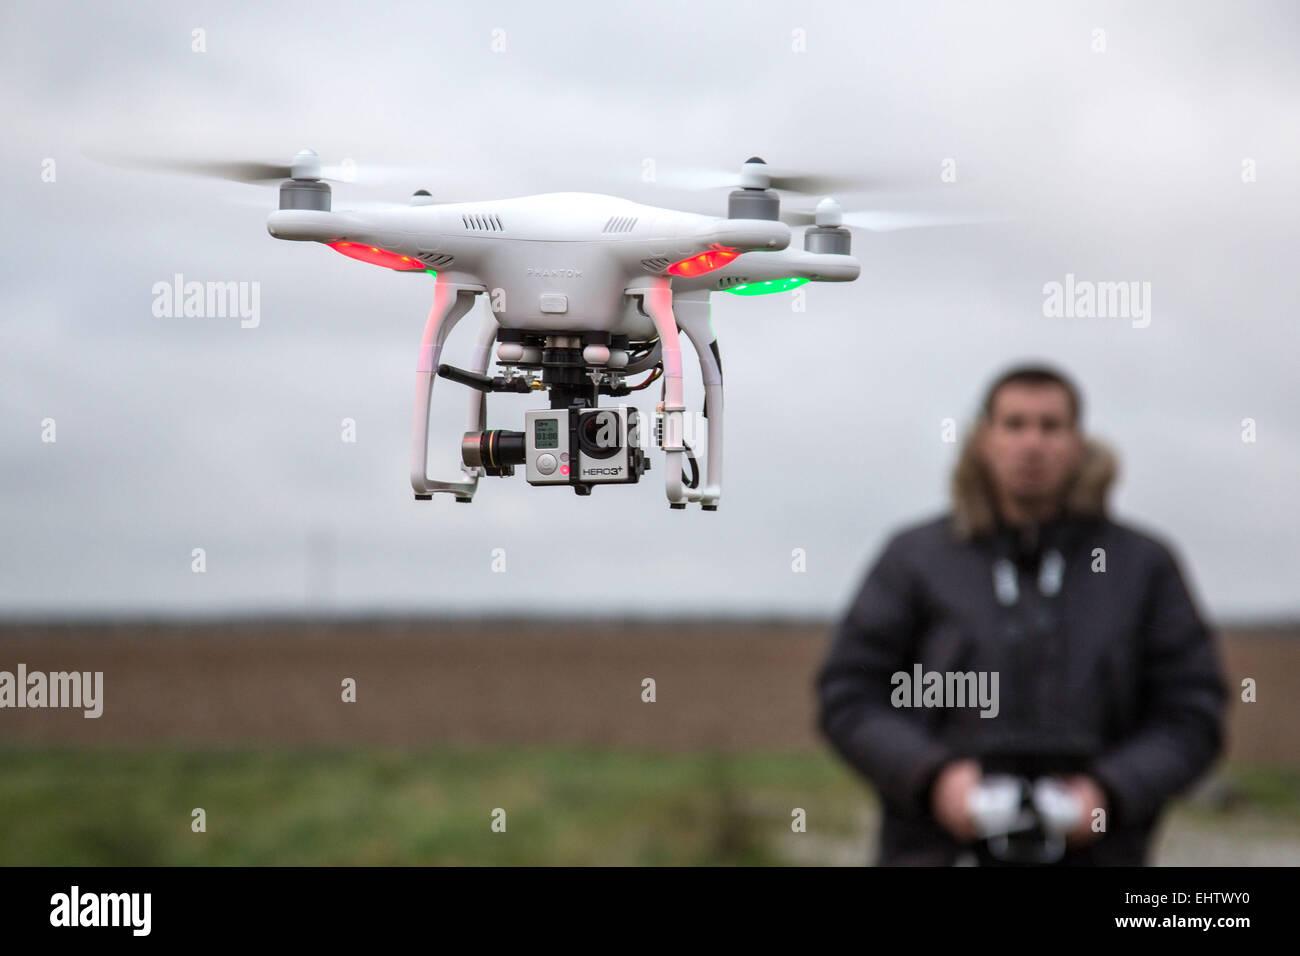 ILLUSTRATION DRONE CIVIL - Stock Image